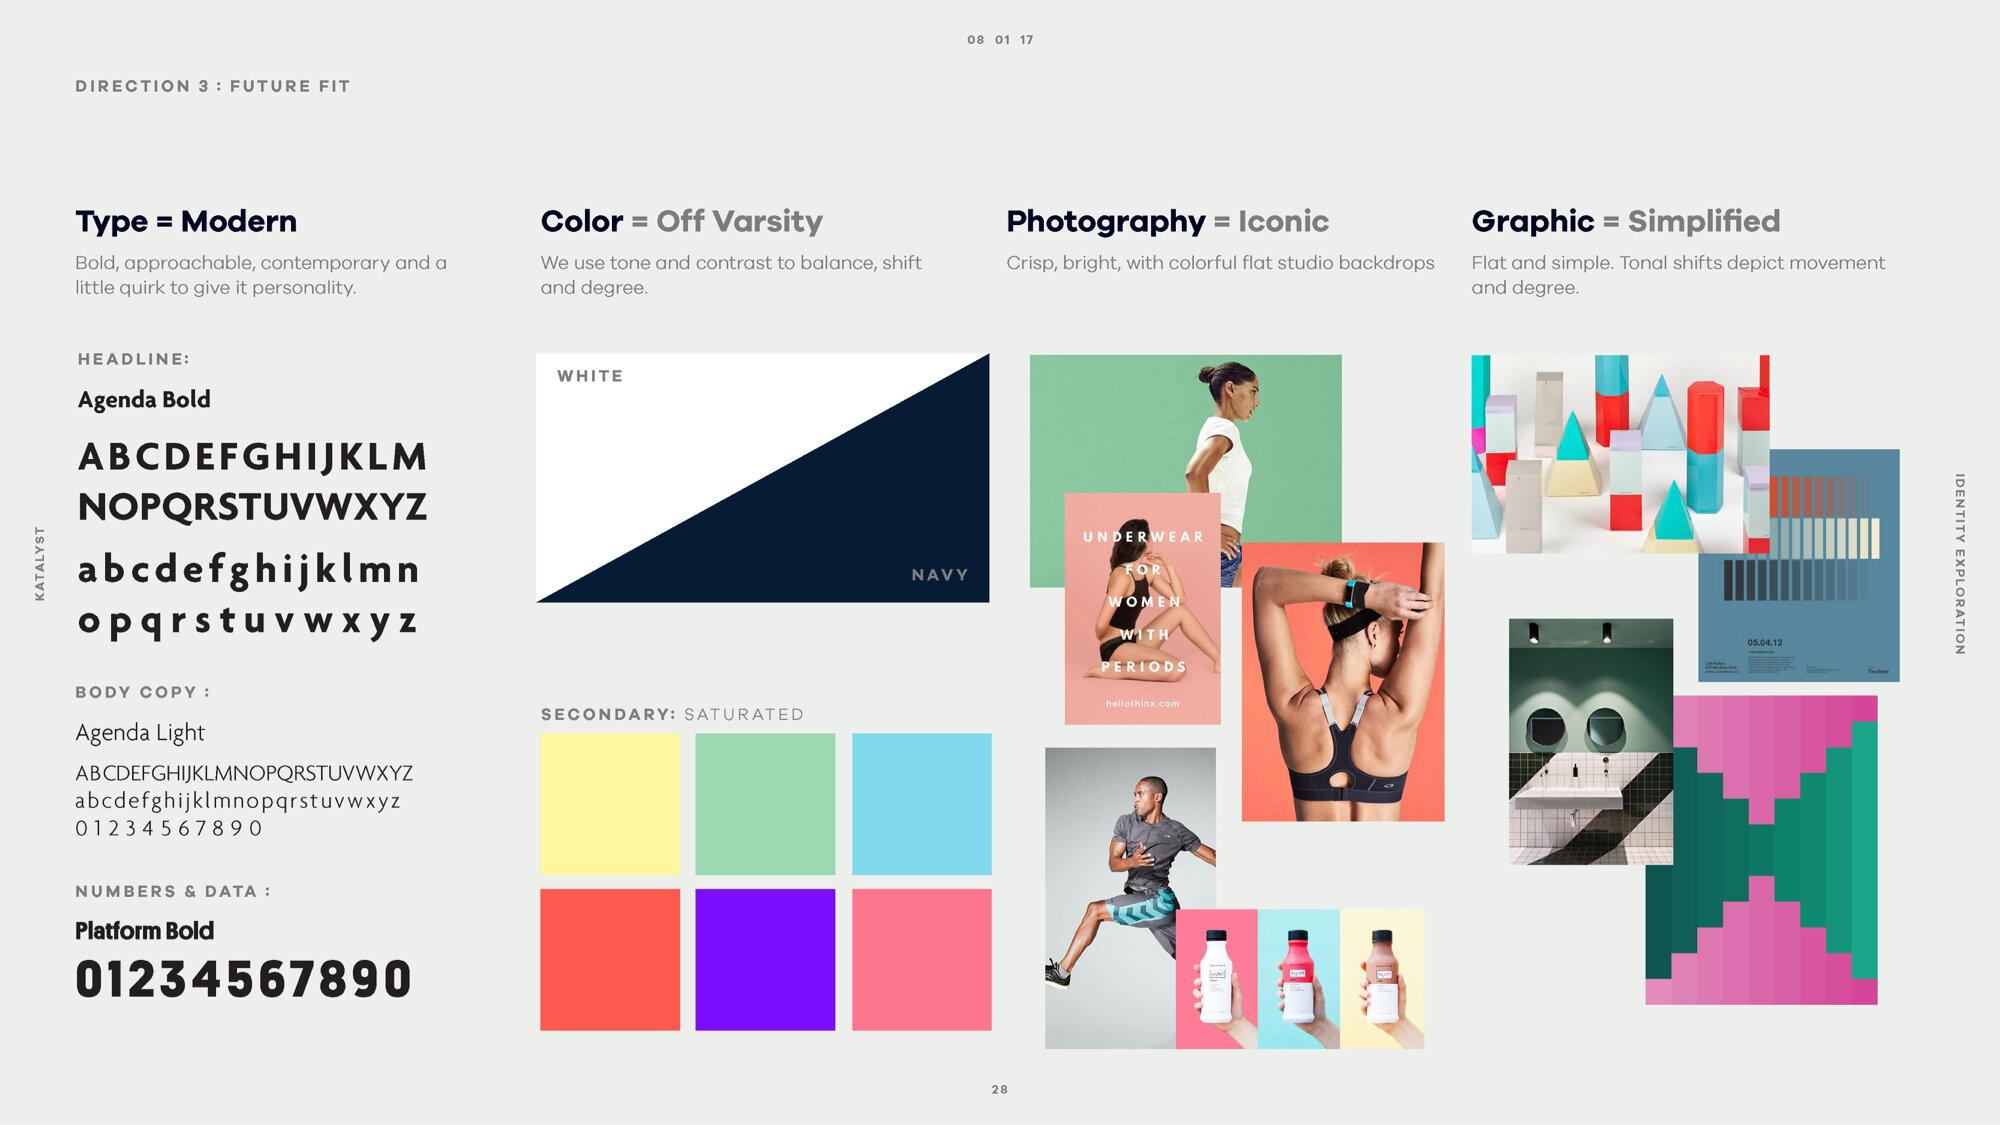 20170731_StudioMega_Katalyst_Brand_Design_Directions_PH1R2_Page_04.jpg